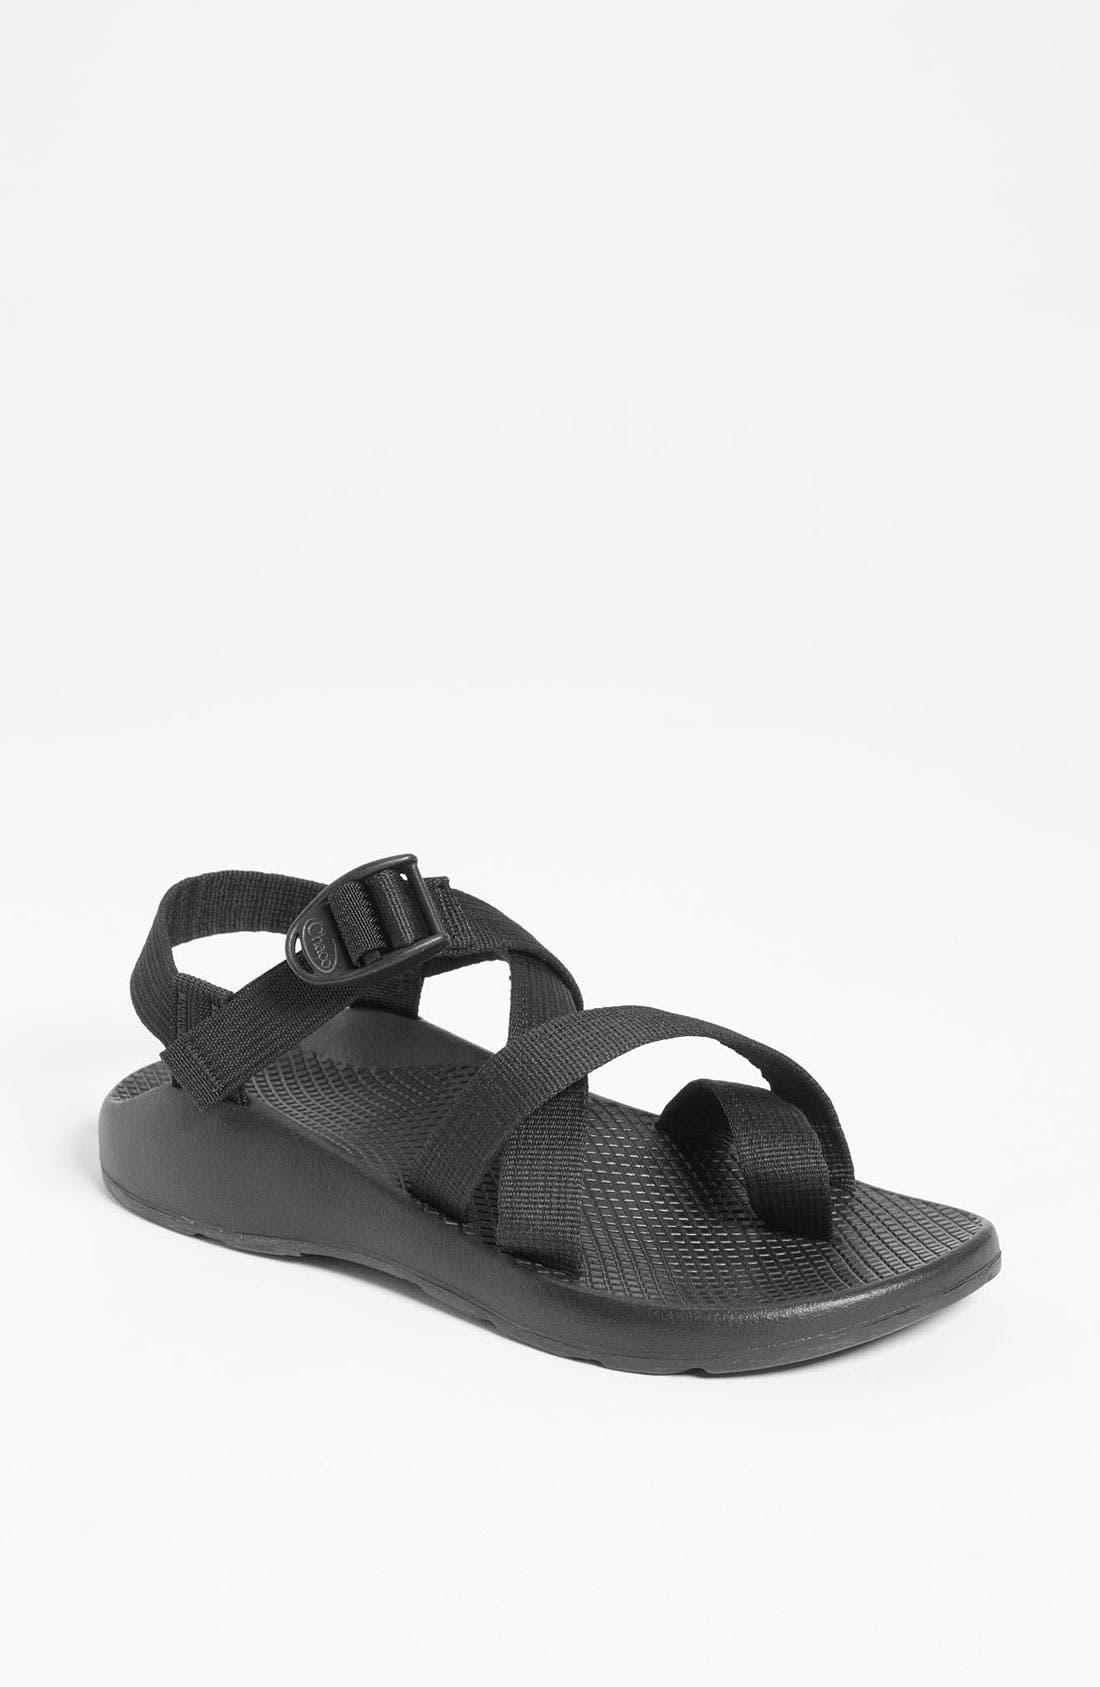 'Z2 Yampa' Sandal,                         Main,                         color, 001